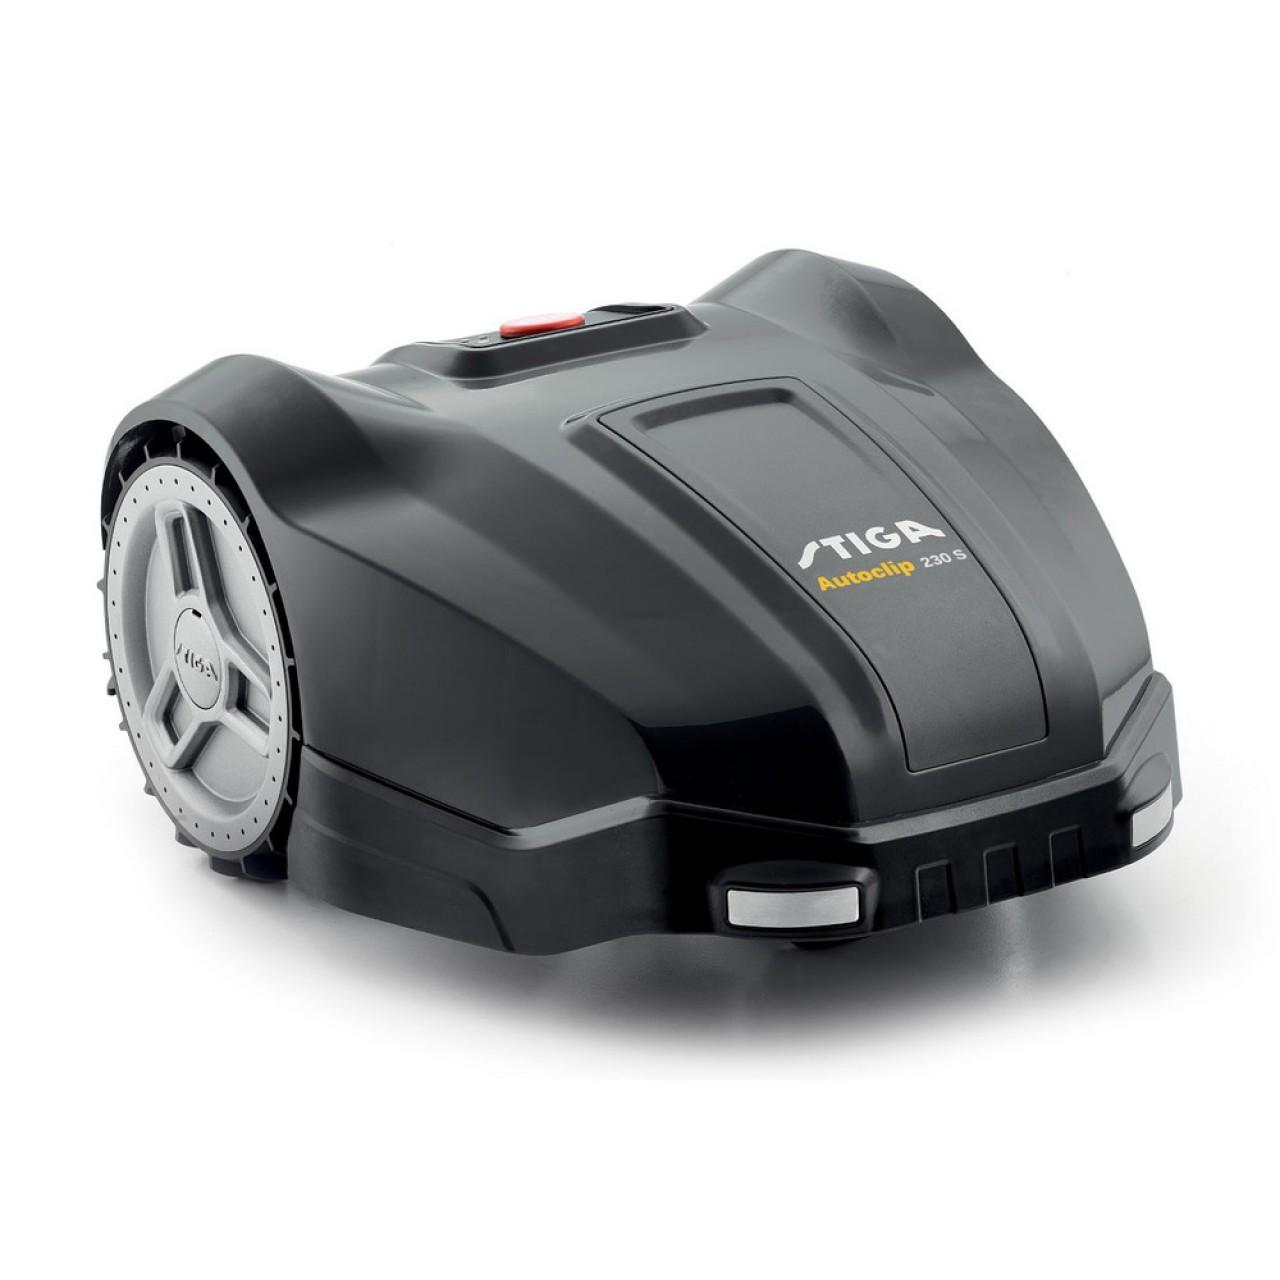 Rasenroboter Autoclip 230S